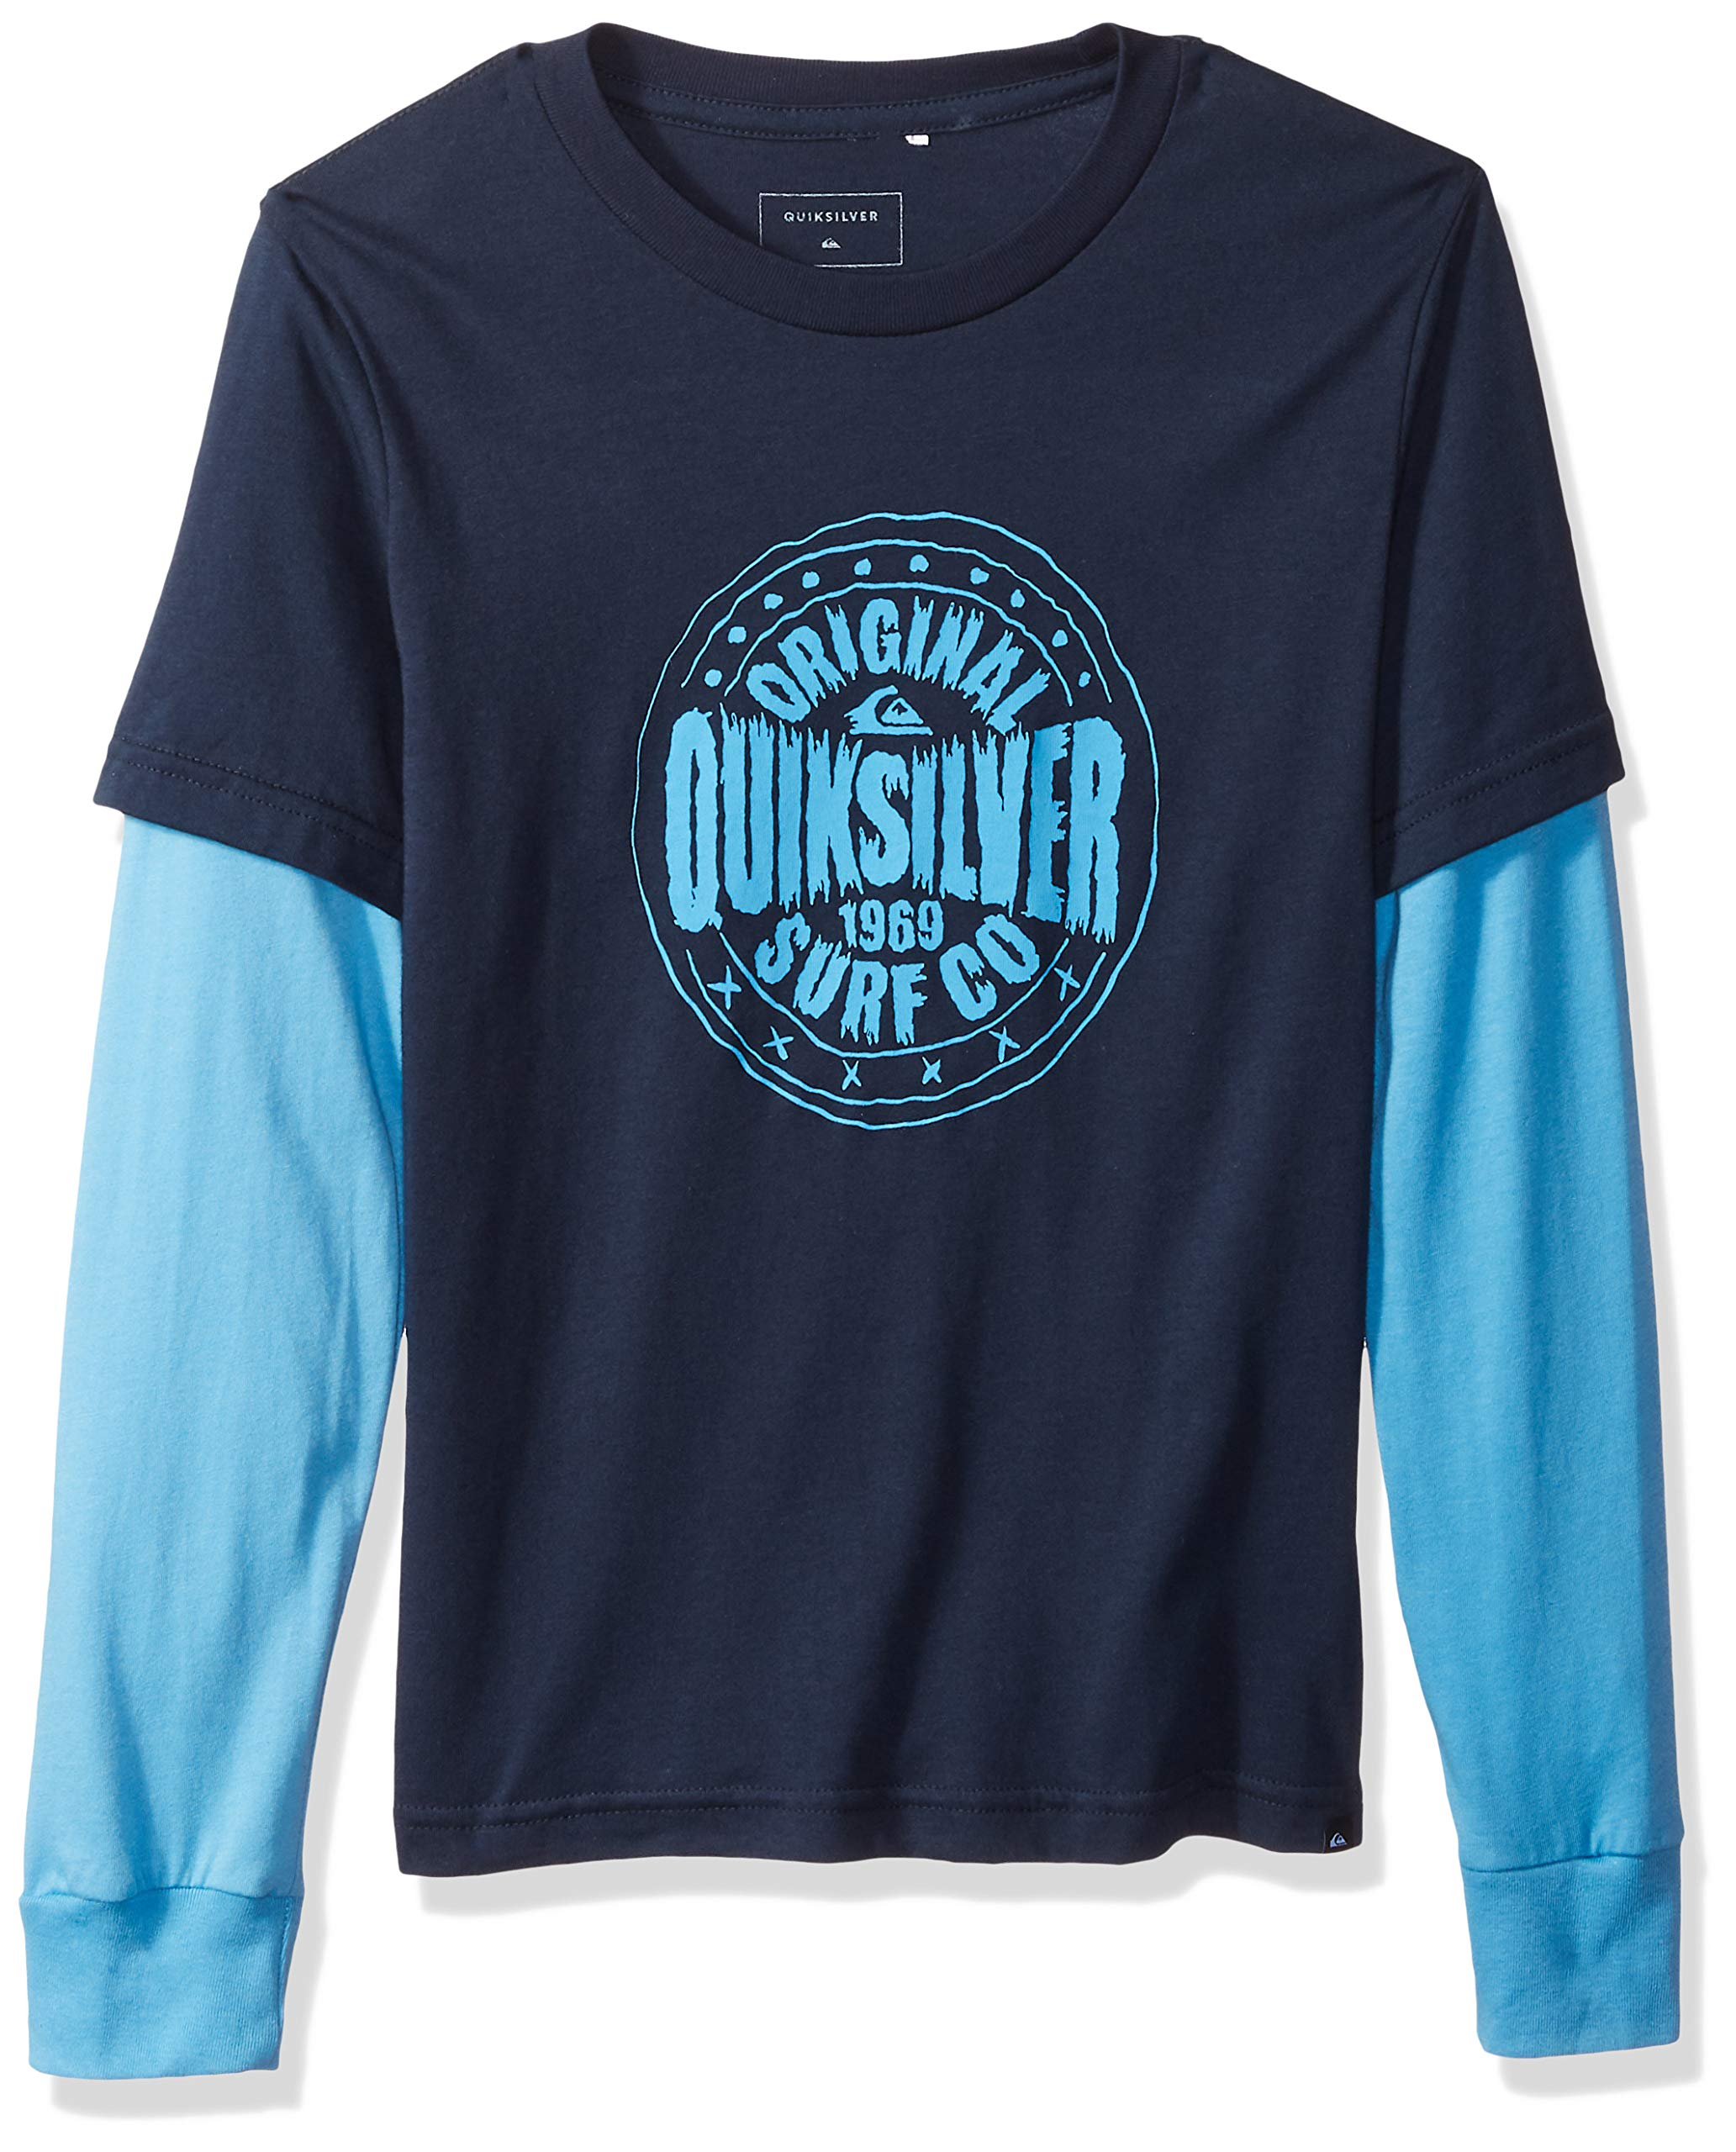 Quiksilver Big Boys' Rocking Rails Youth Long Sleeve Tee Shirt, Navy Blazer, S/10